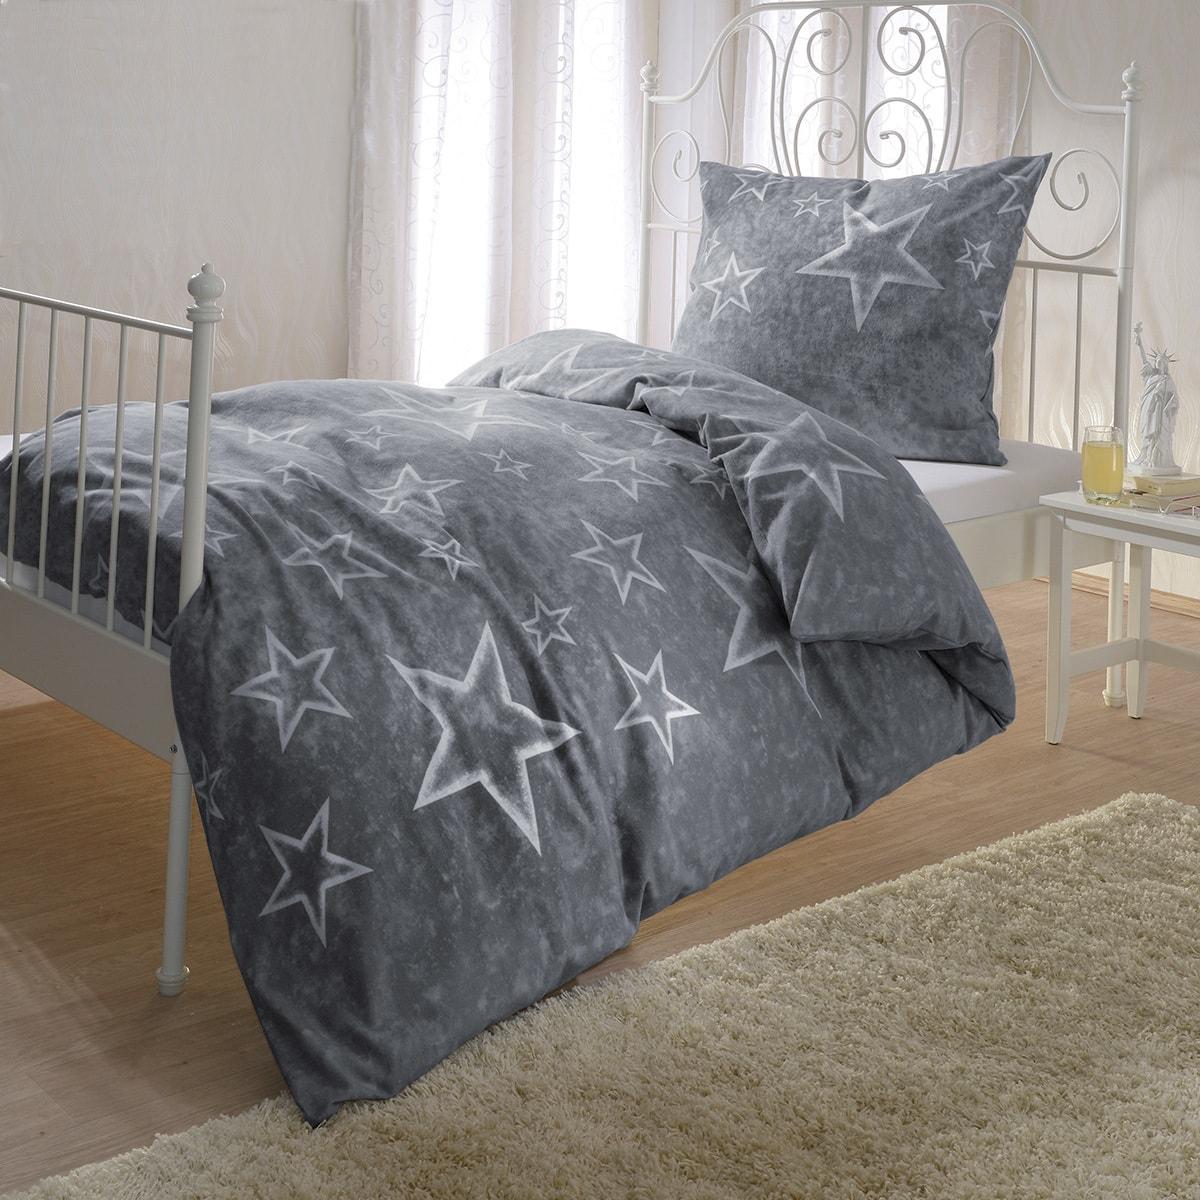 bettwarenshop biber bettw sche sterne anthrazit g nstig. Black Bedroom Furniture Sets. Home Design Ideas